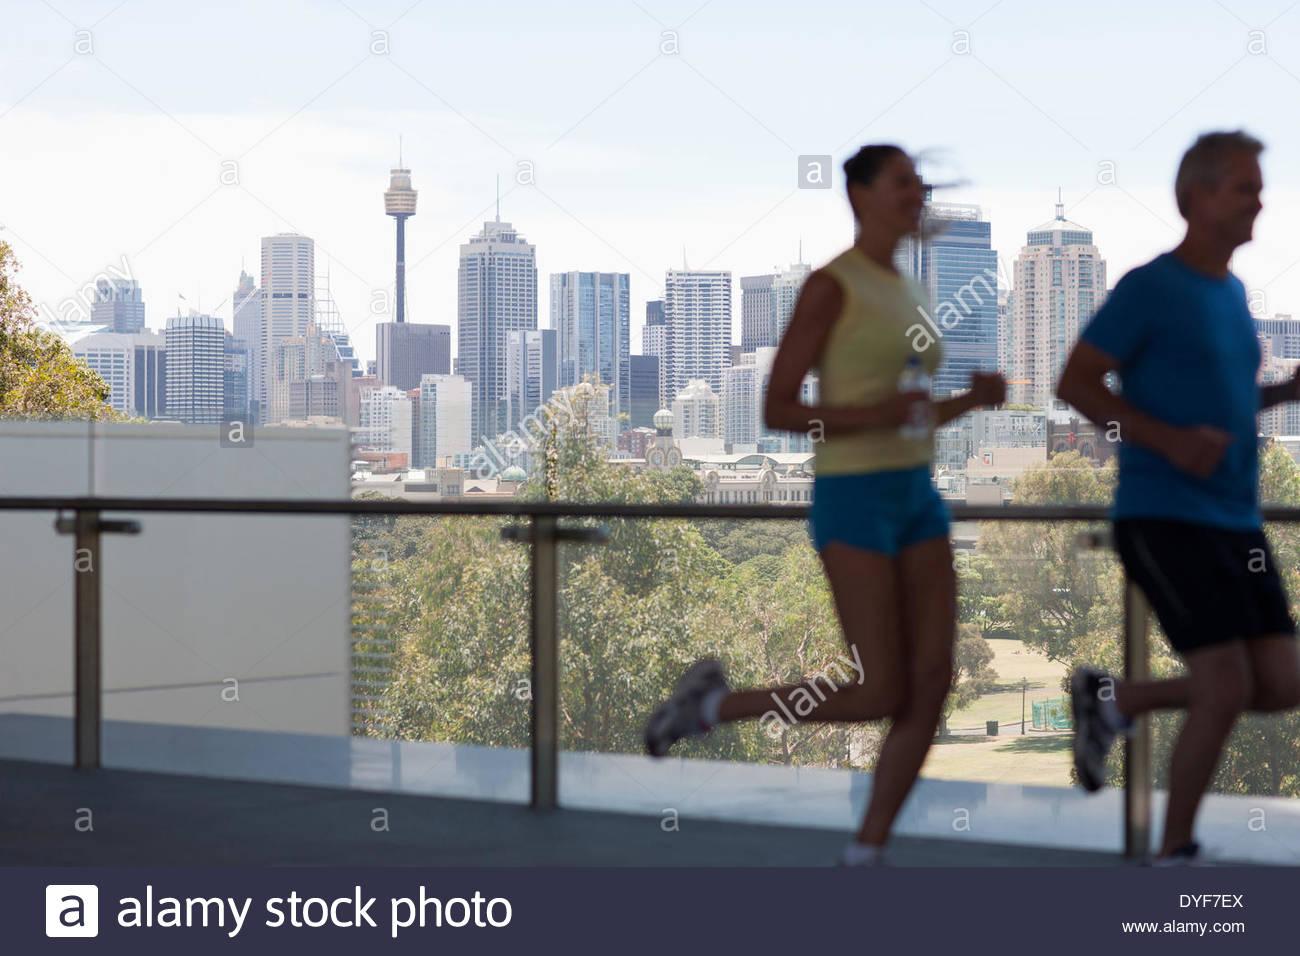 Couple running in urban setting - Stock Image